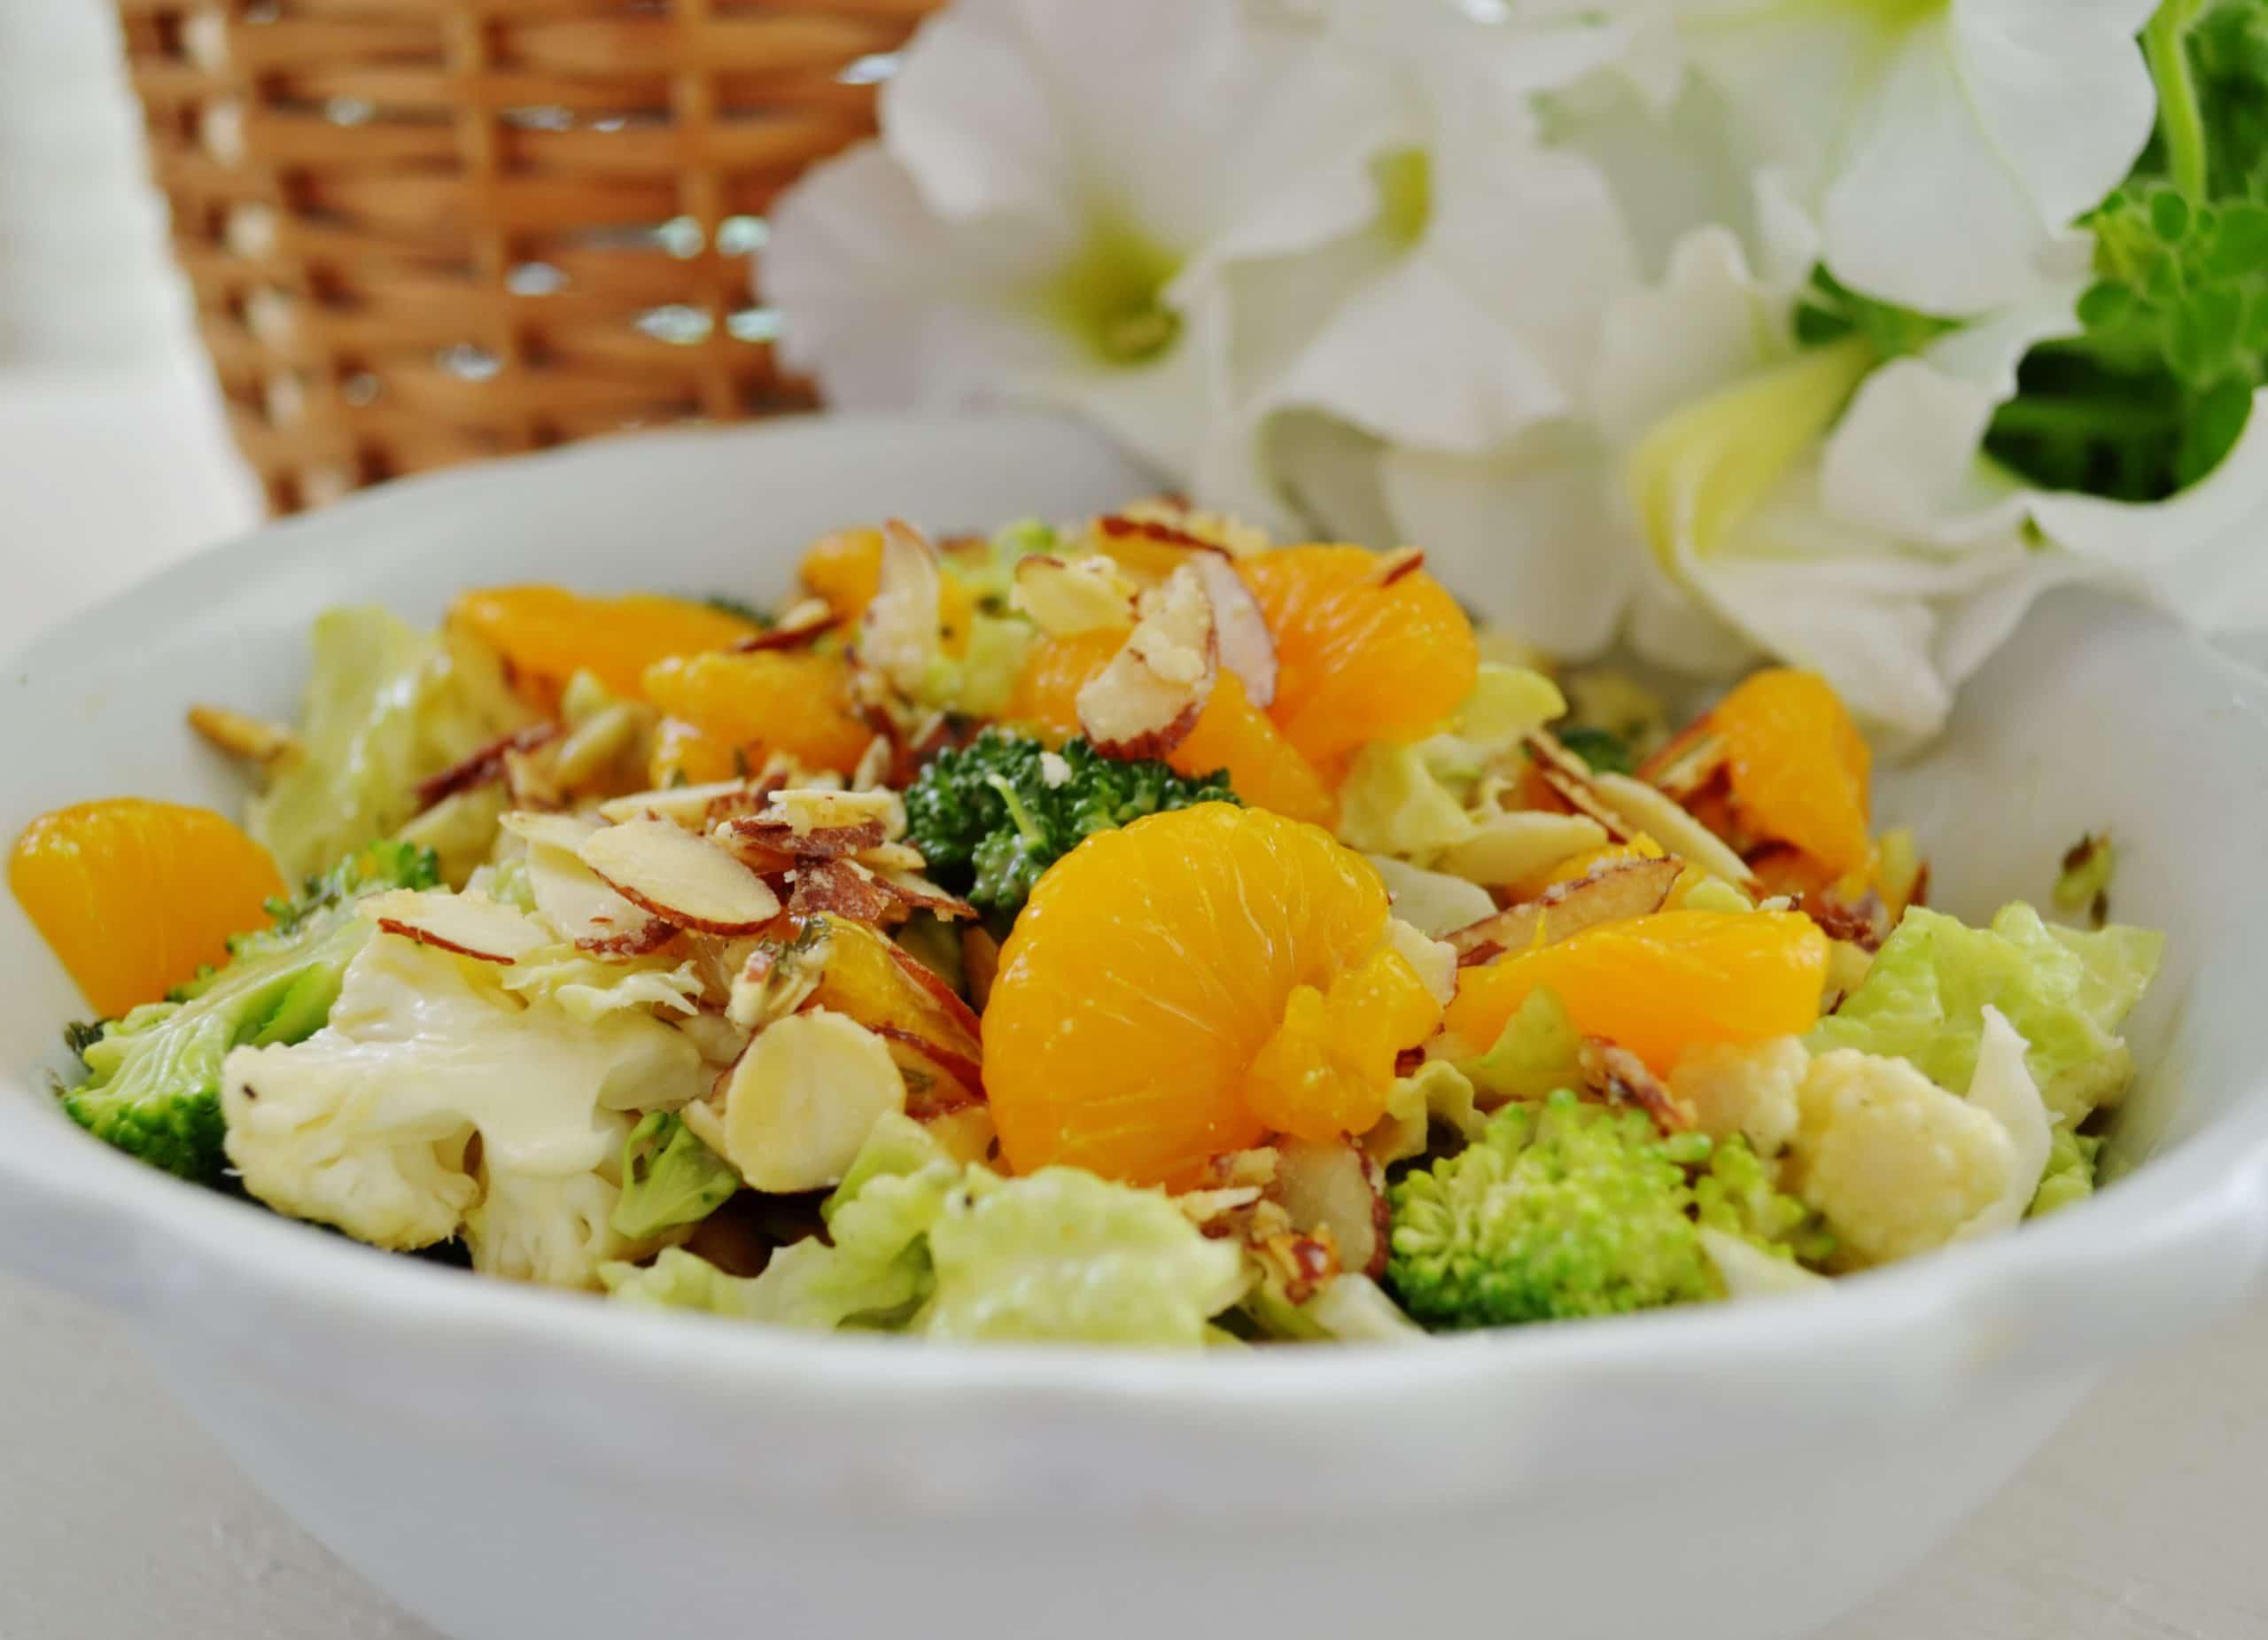 Nappa Broccoli Cauliflower Salad